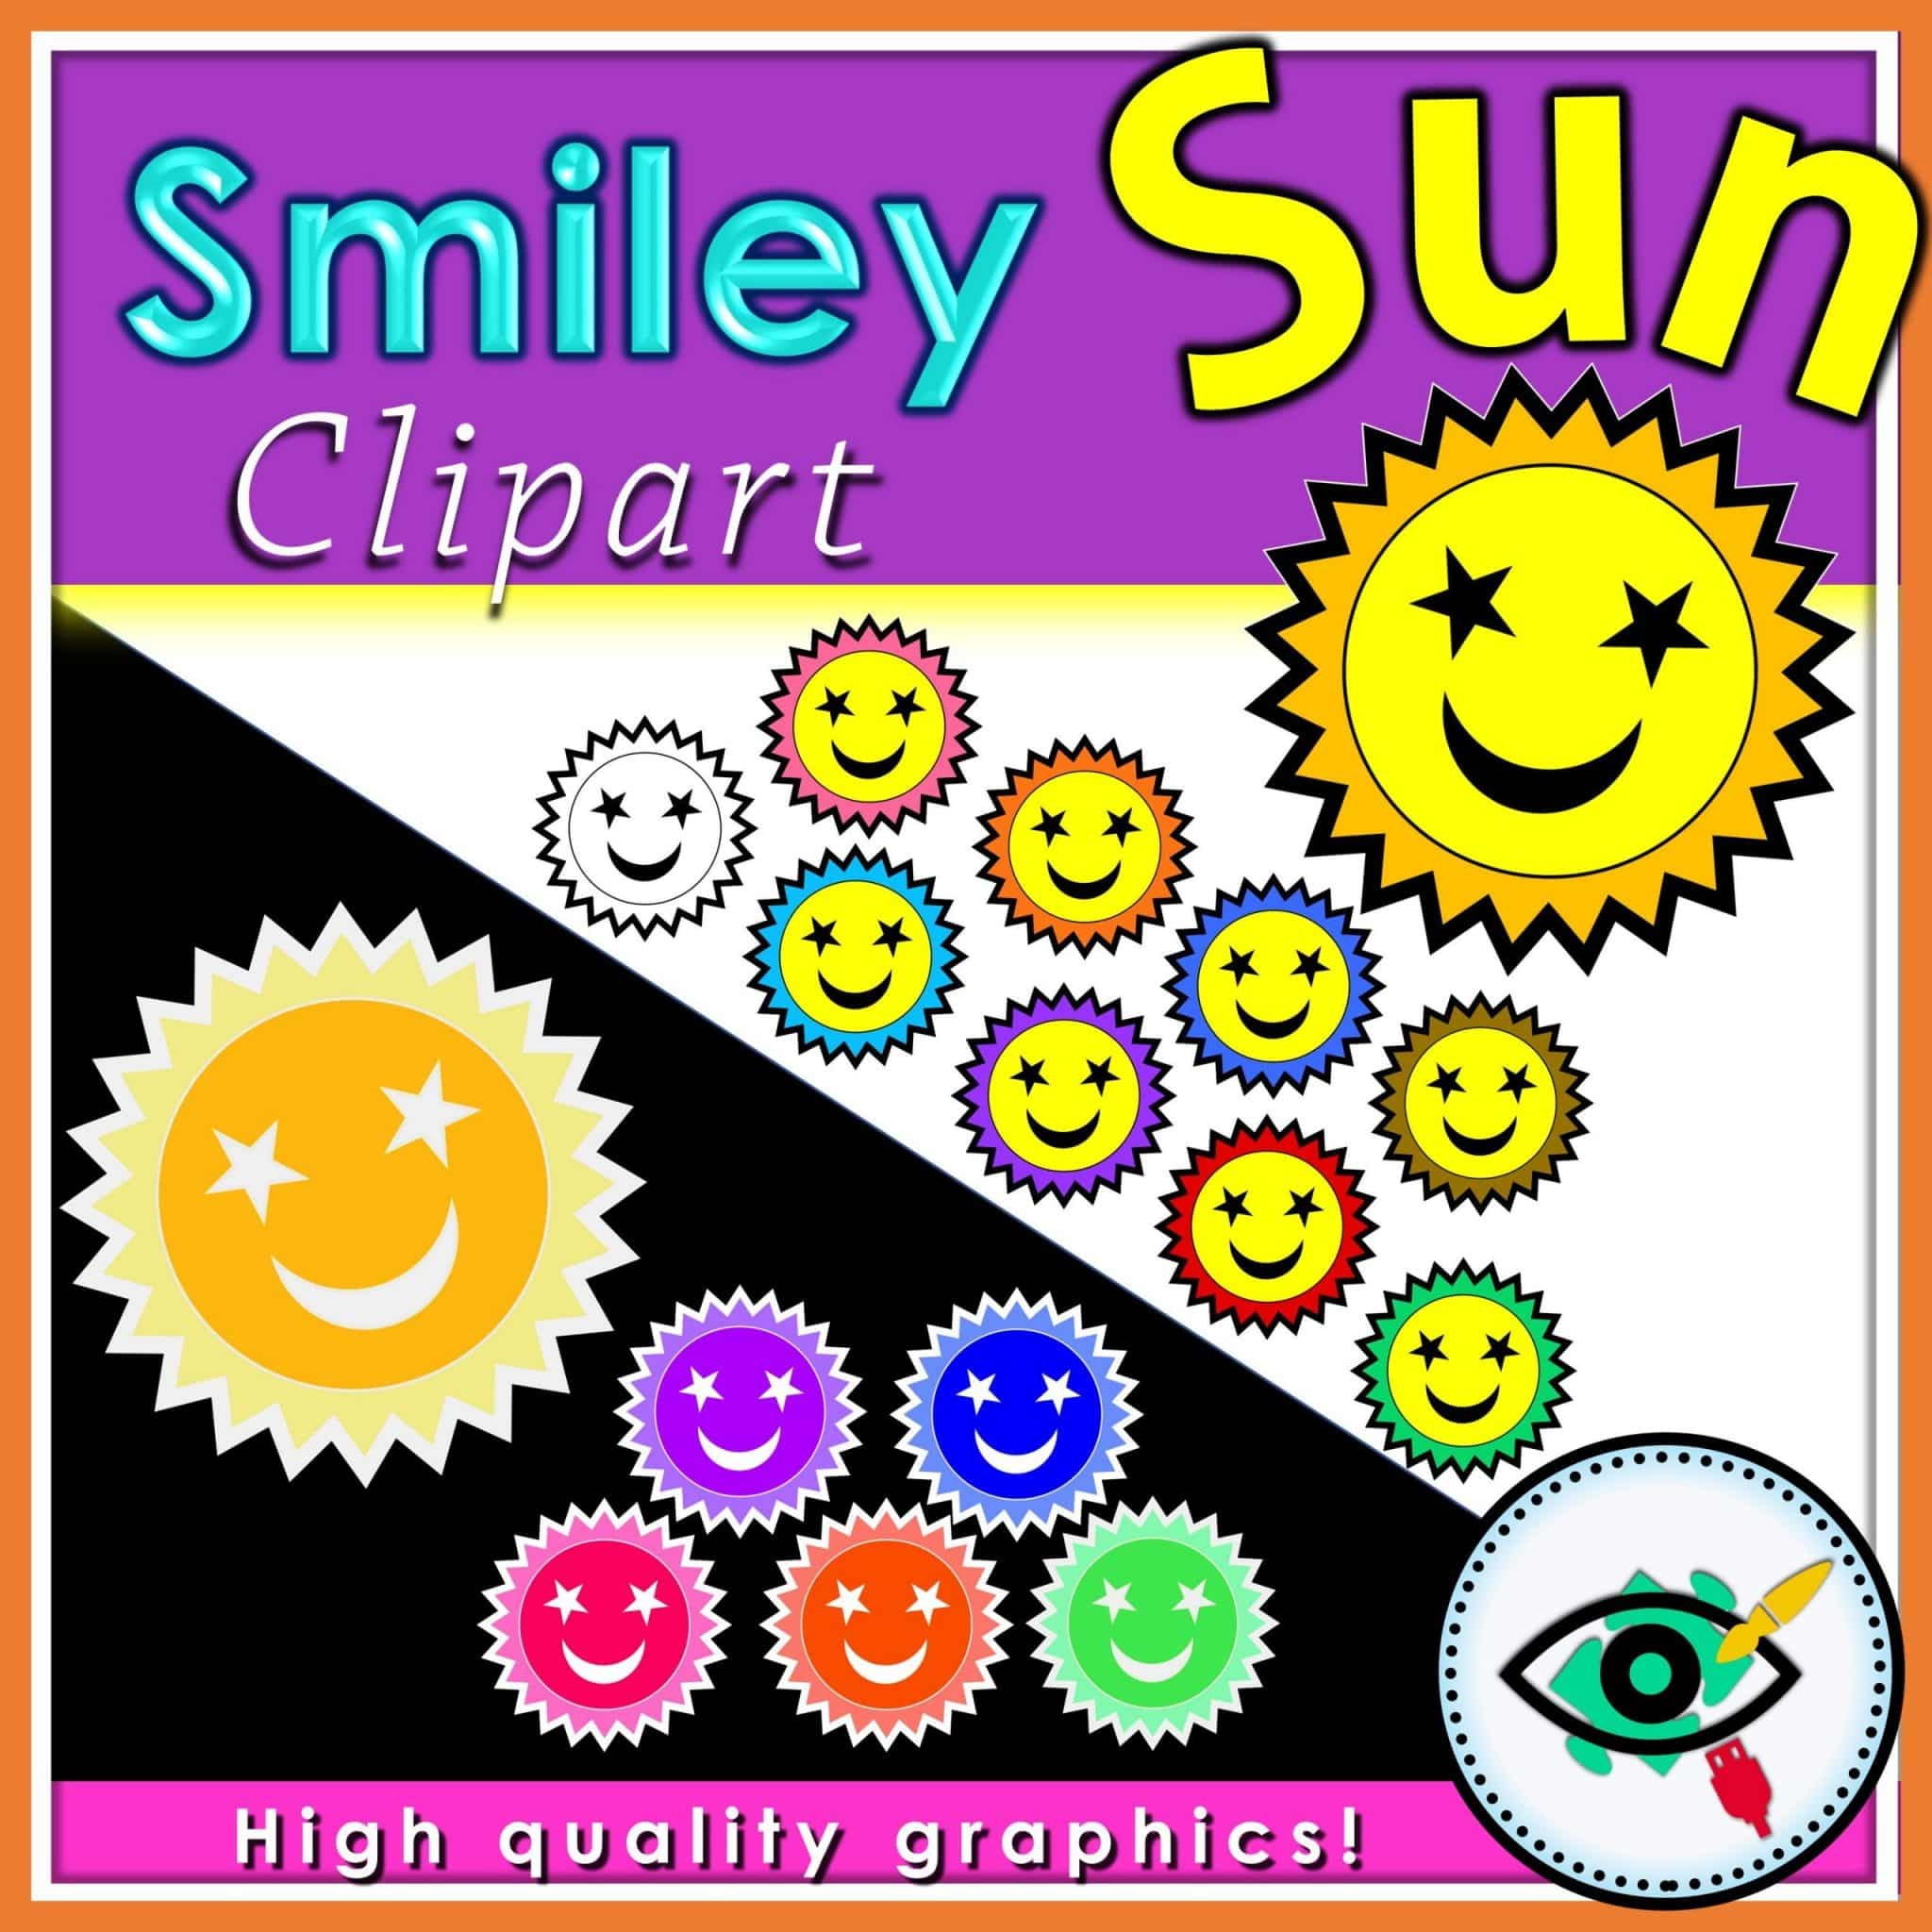 Summer - Clipart - Smiley Sun | Planerium